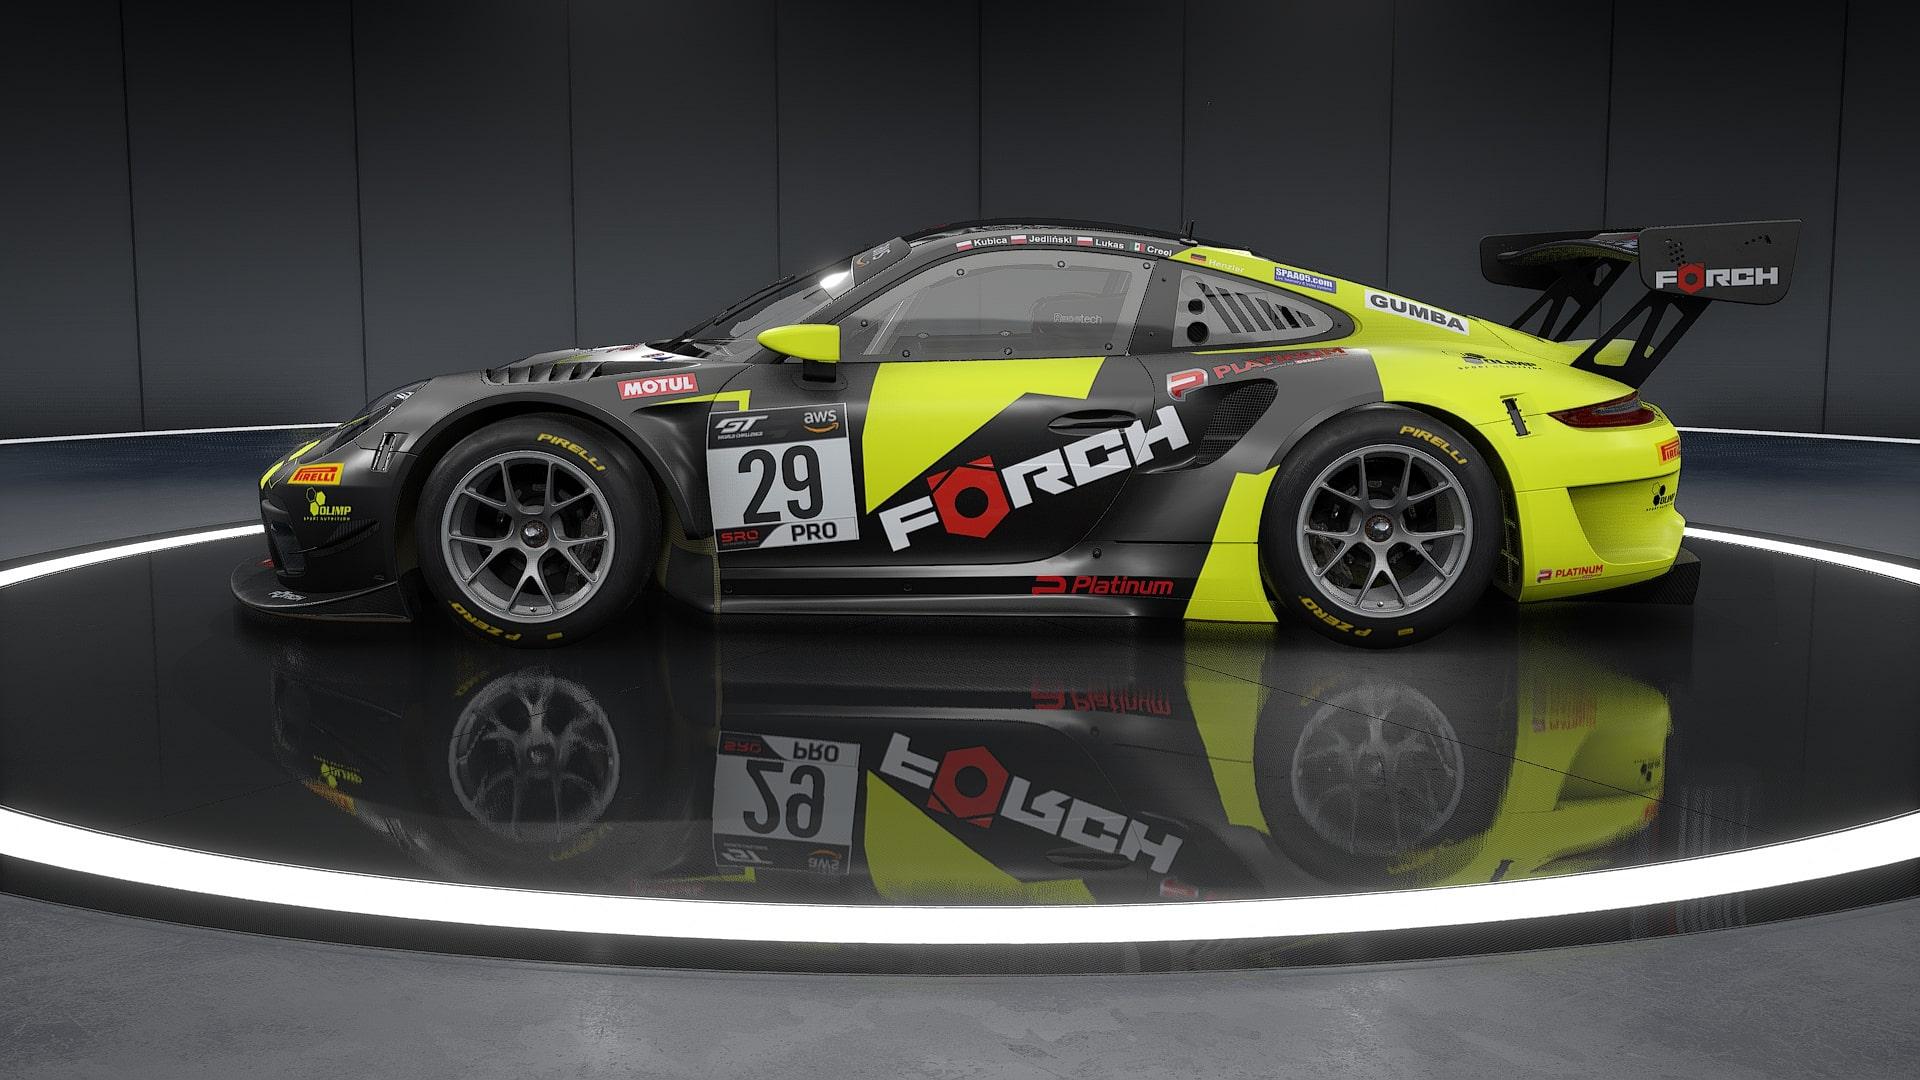 Porsche 911ii Gt3 R Forch Racing Dubai 24h 2017 29 Racedepartment